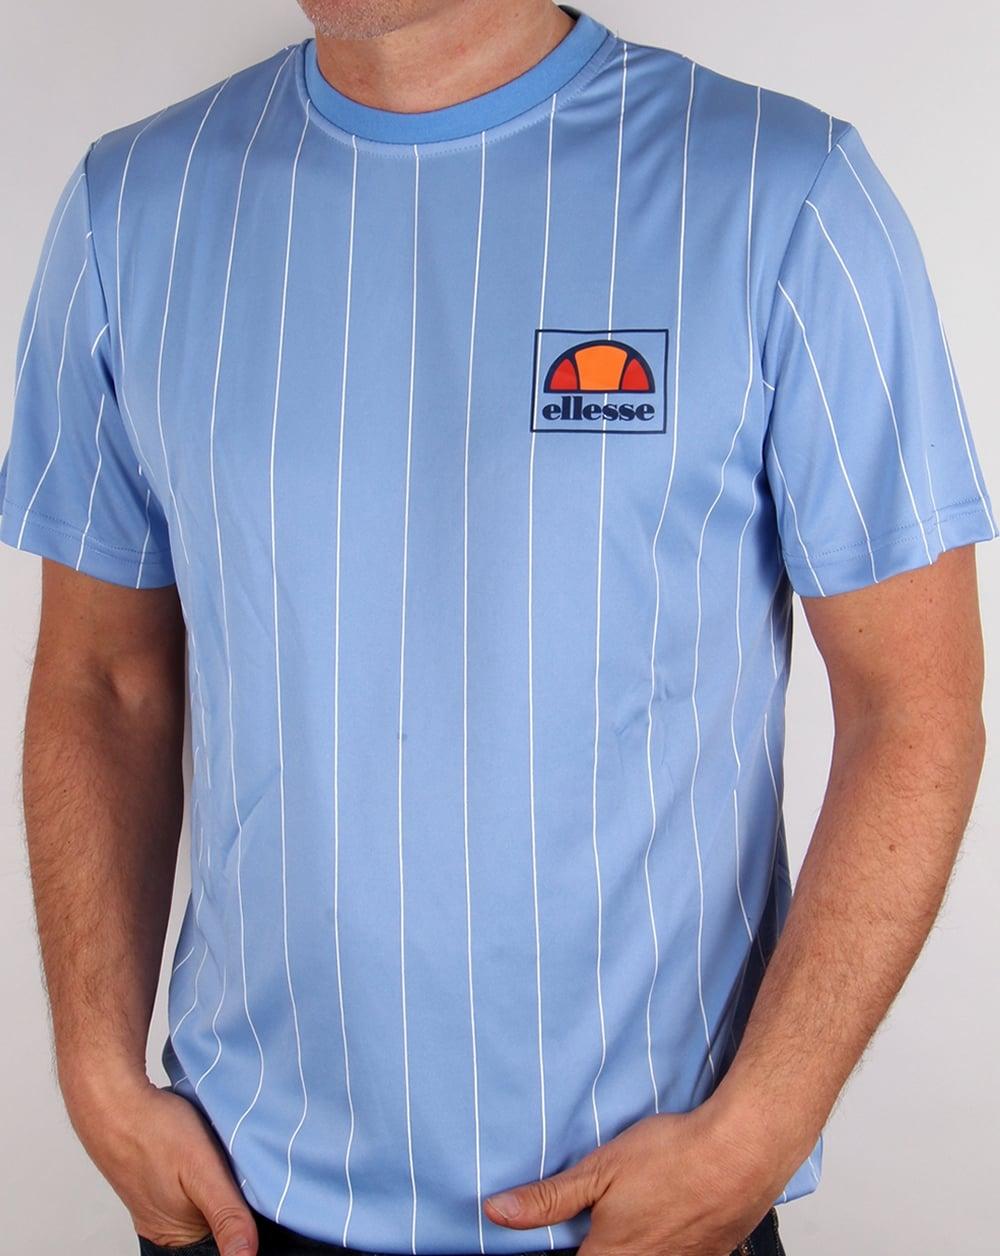 ellesse salento striped t shirt sky blue football tee mens. Black Bedroom Furniture Sets. Home Design Ideas